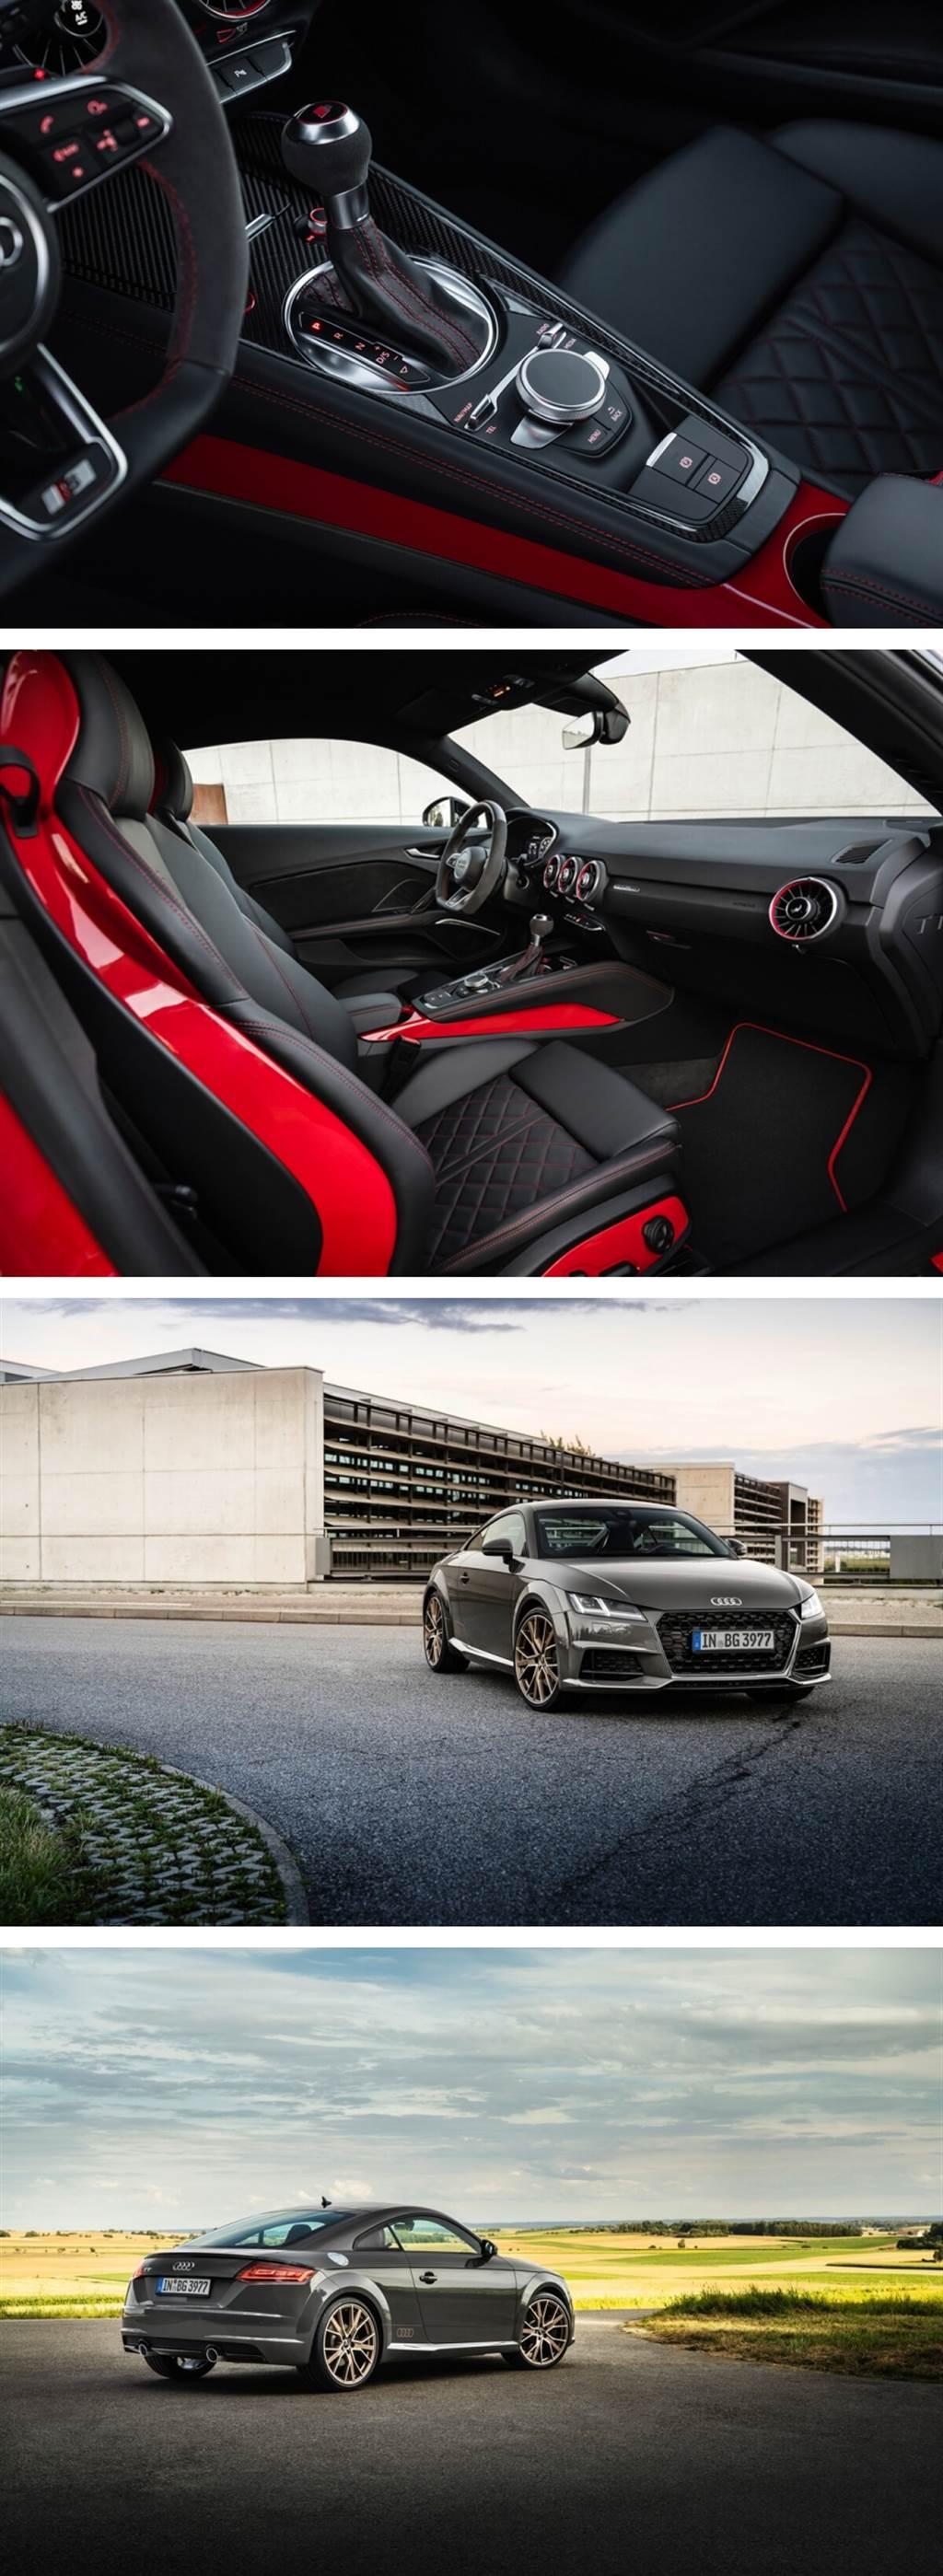 運動與優雅完美結合!Audi TT推出competition plus與Bronze selection特仕款